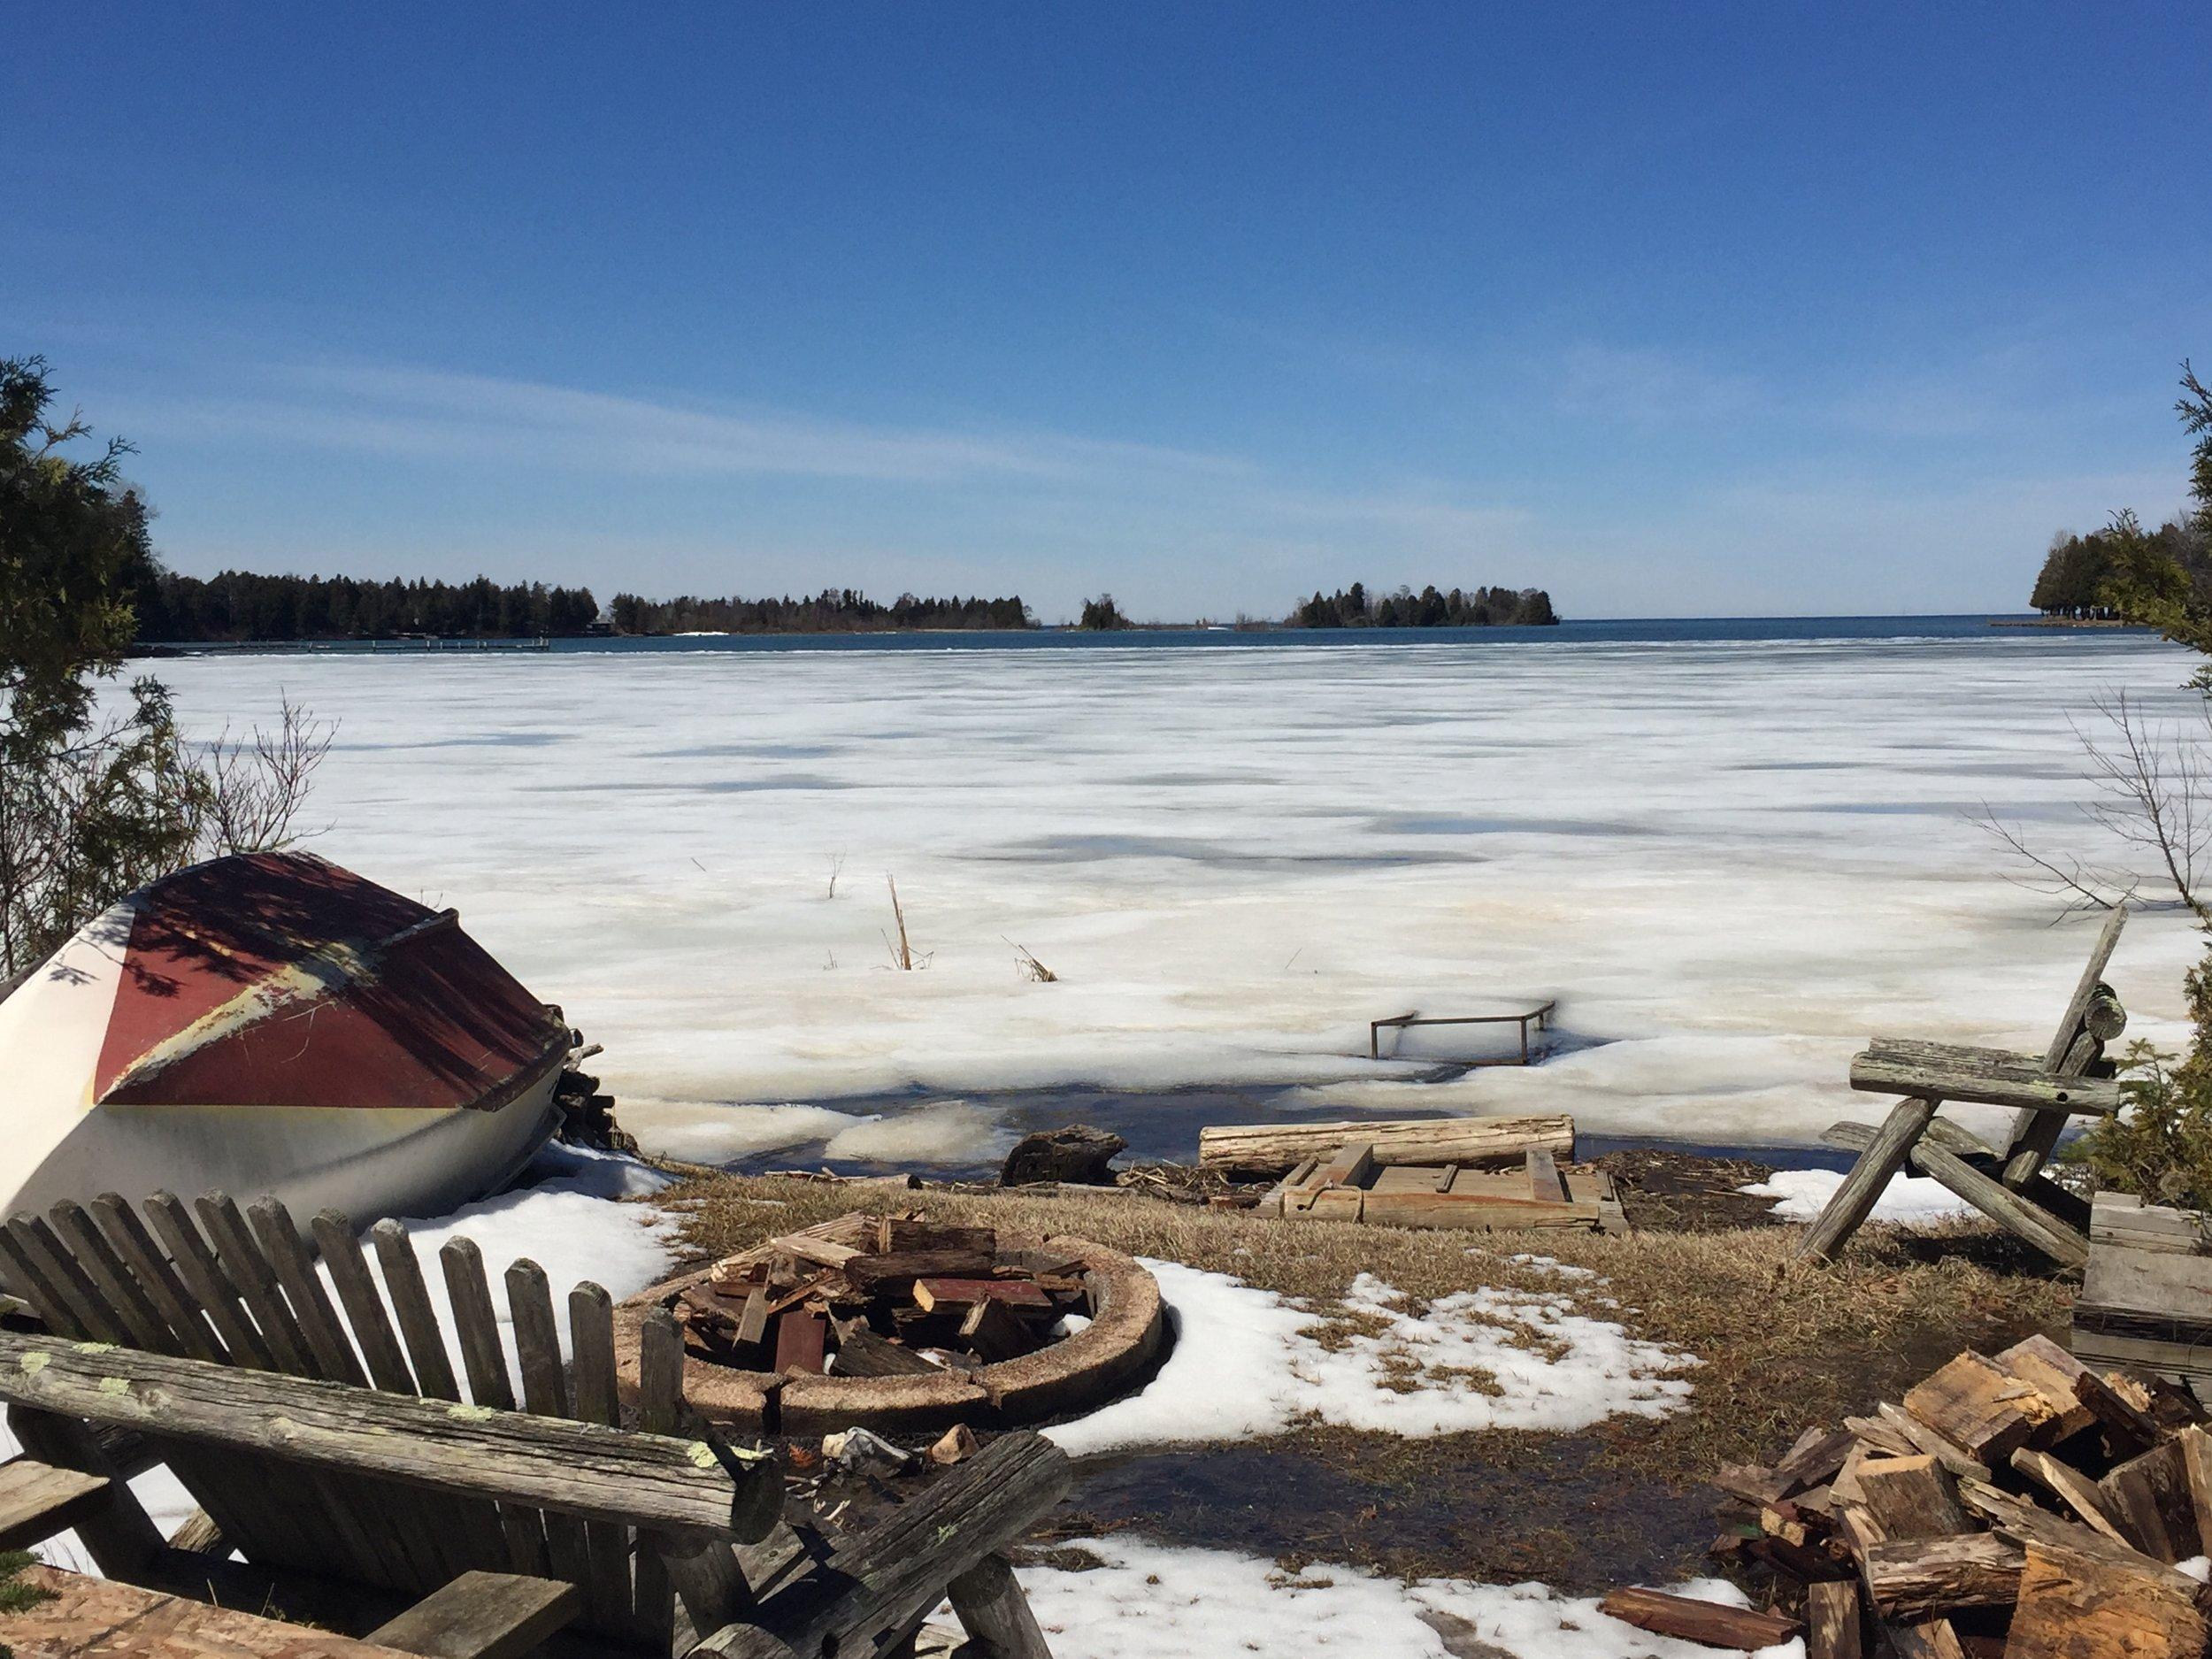 Figenschau Bay - April 15 - The ice starts to change.